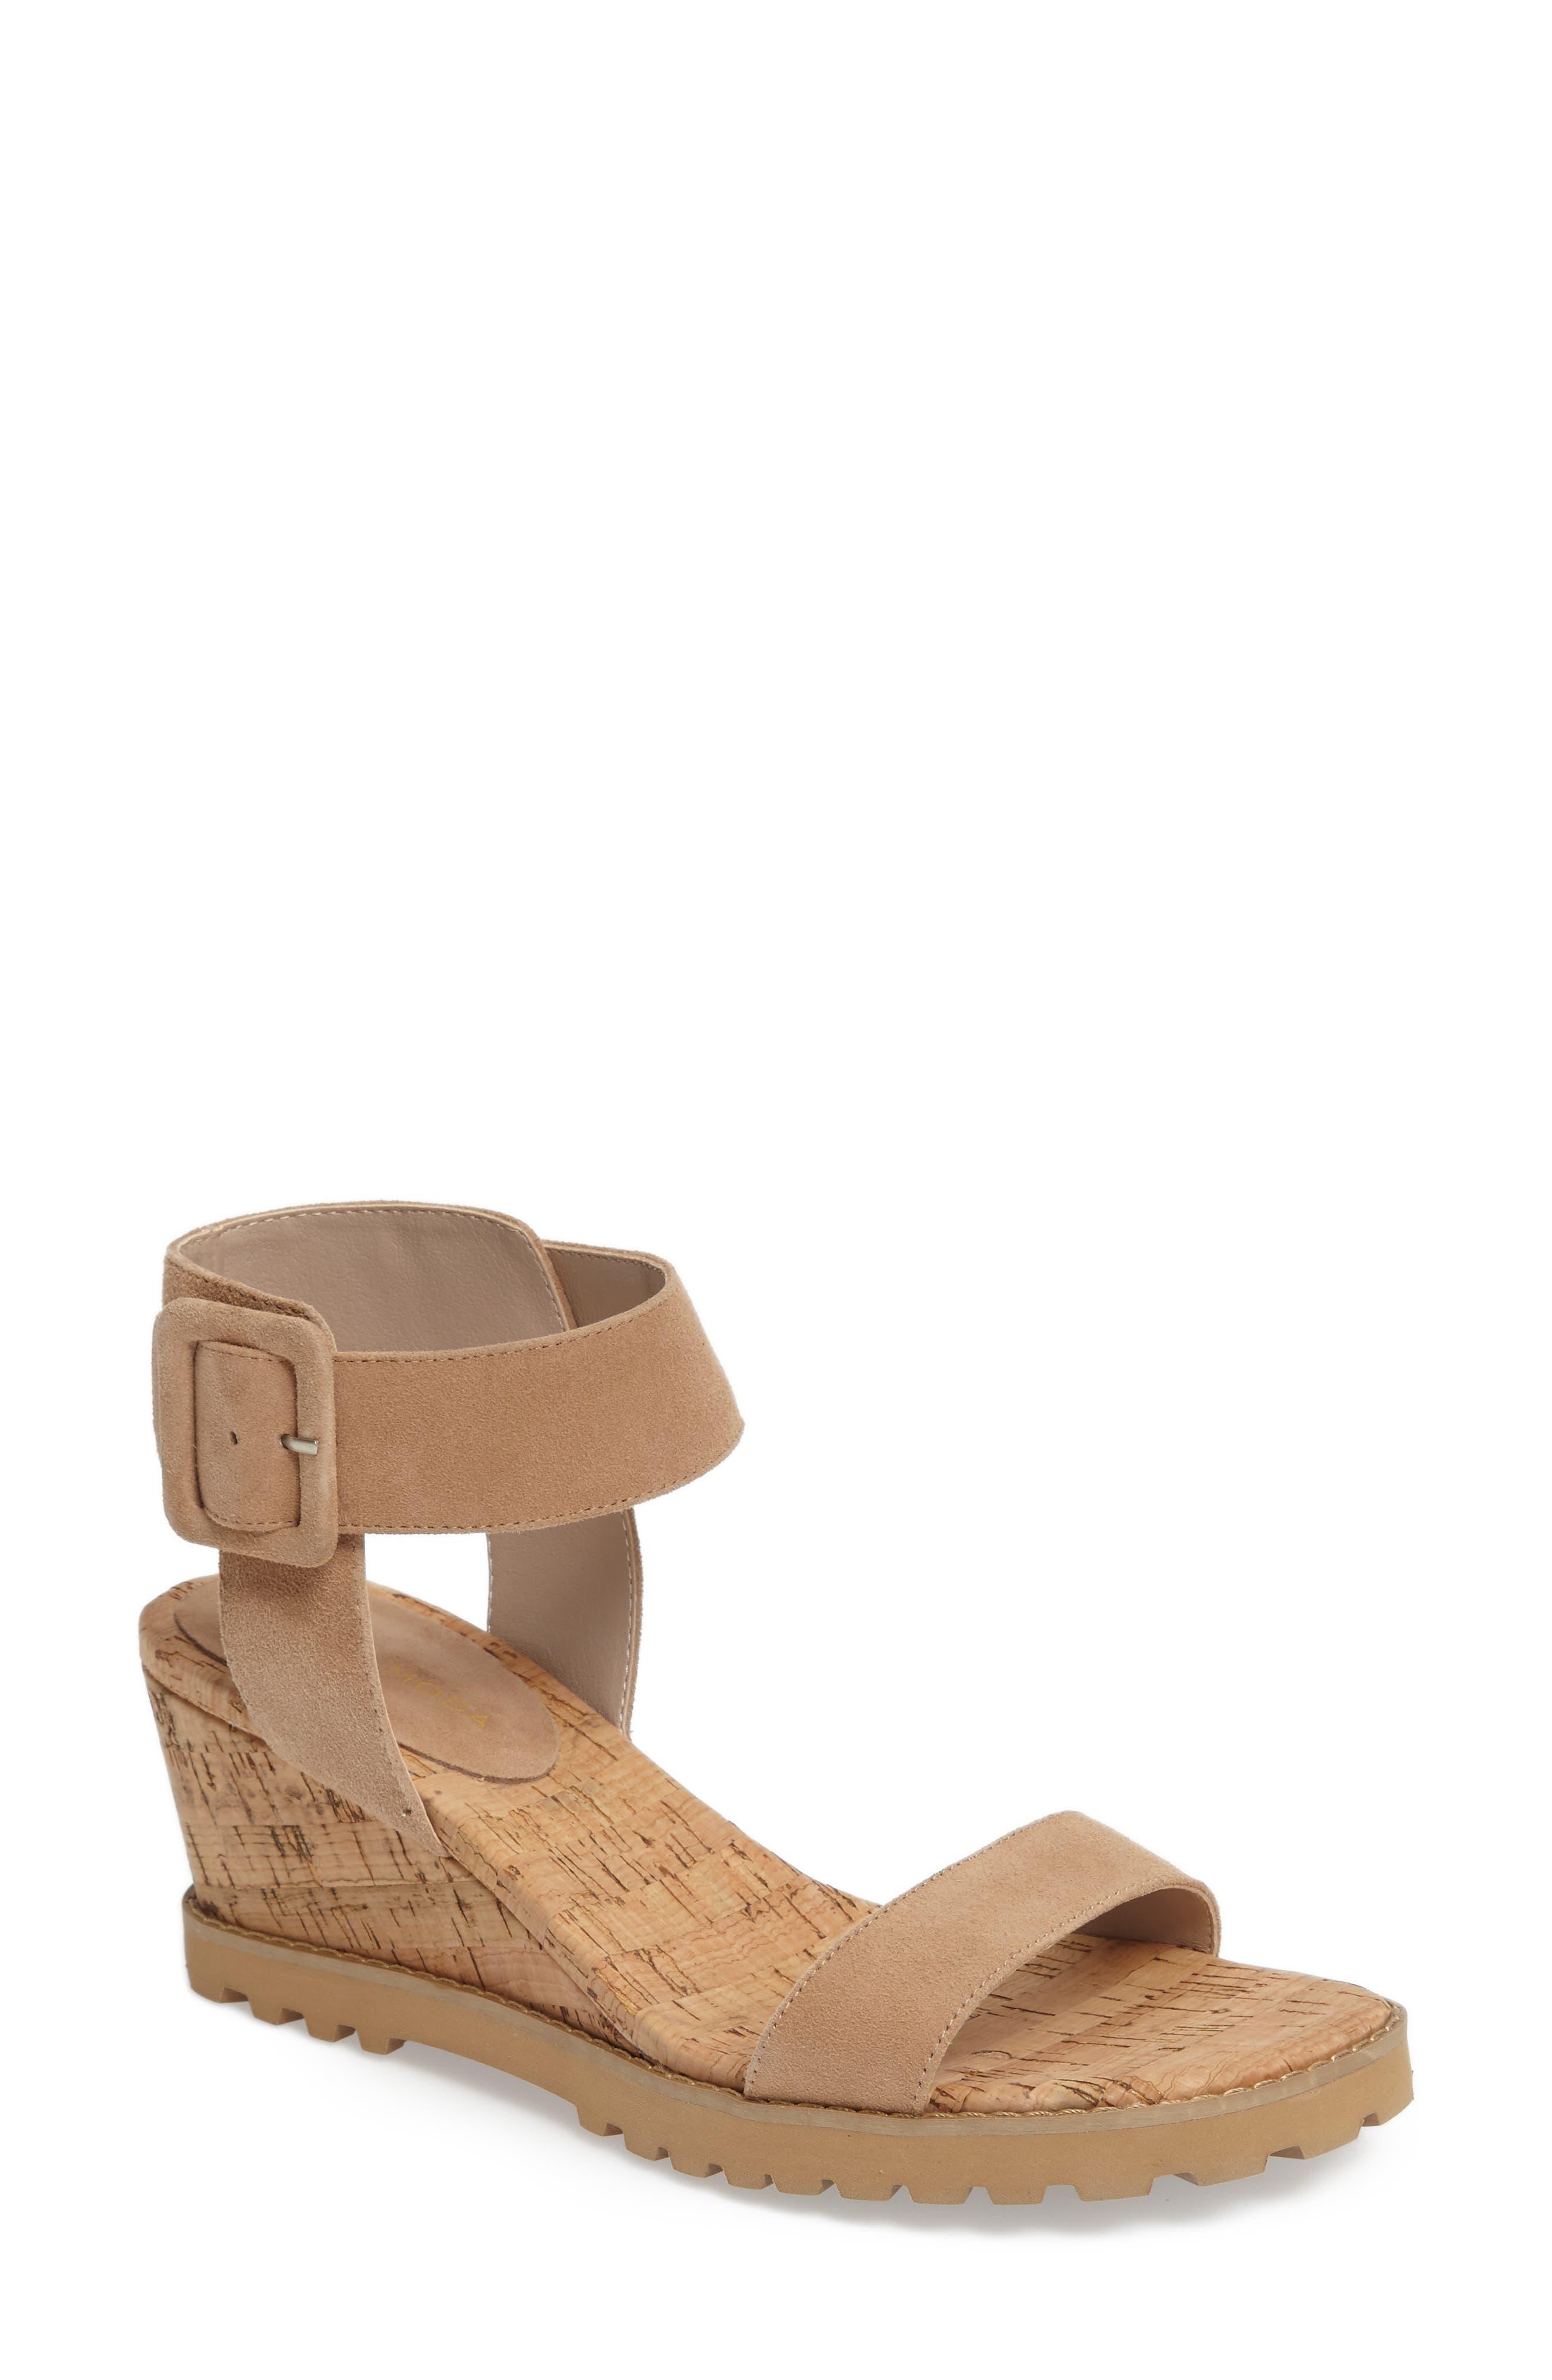 Pelle Moda Rian Wedge Sandal (Women)